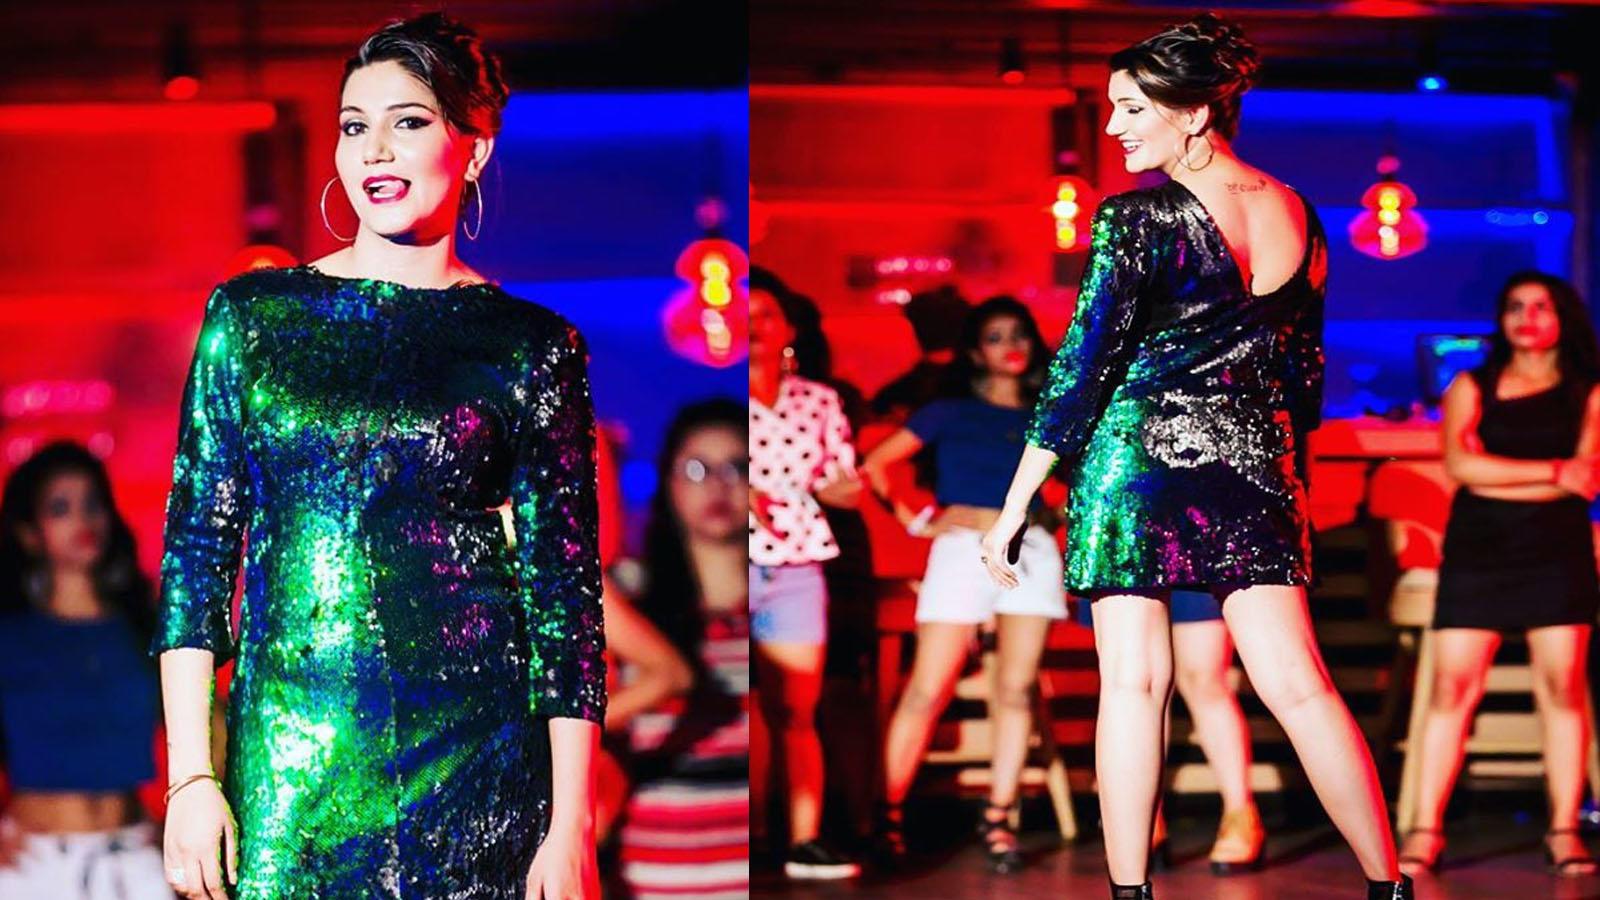 Haryanvi sensation Sapna Choudhary looks gorgeous in this bodycon dress!